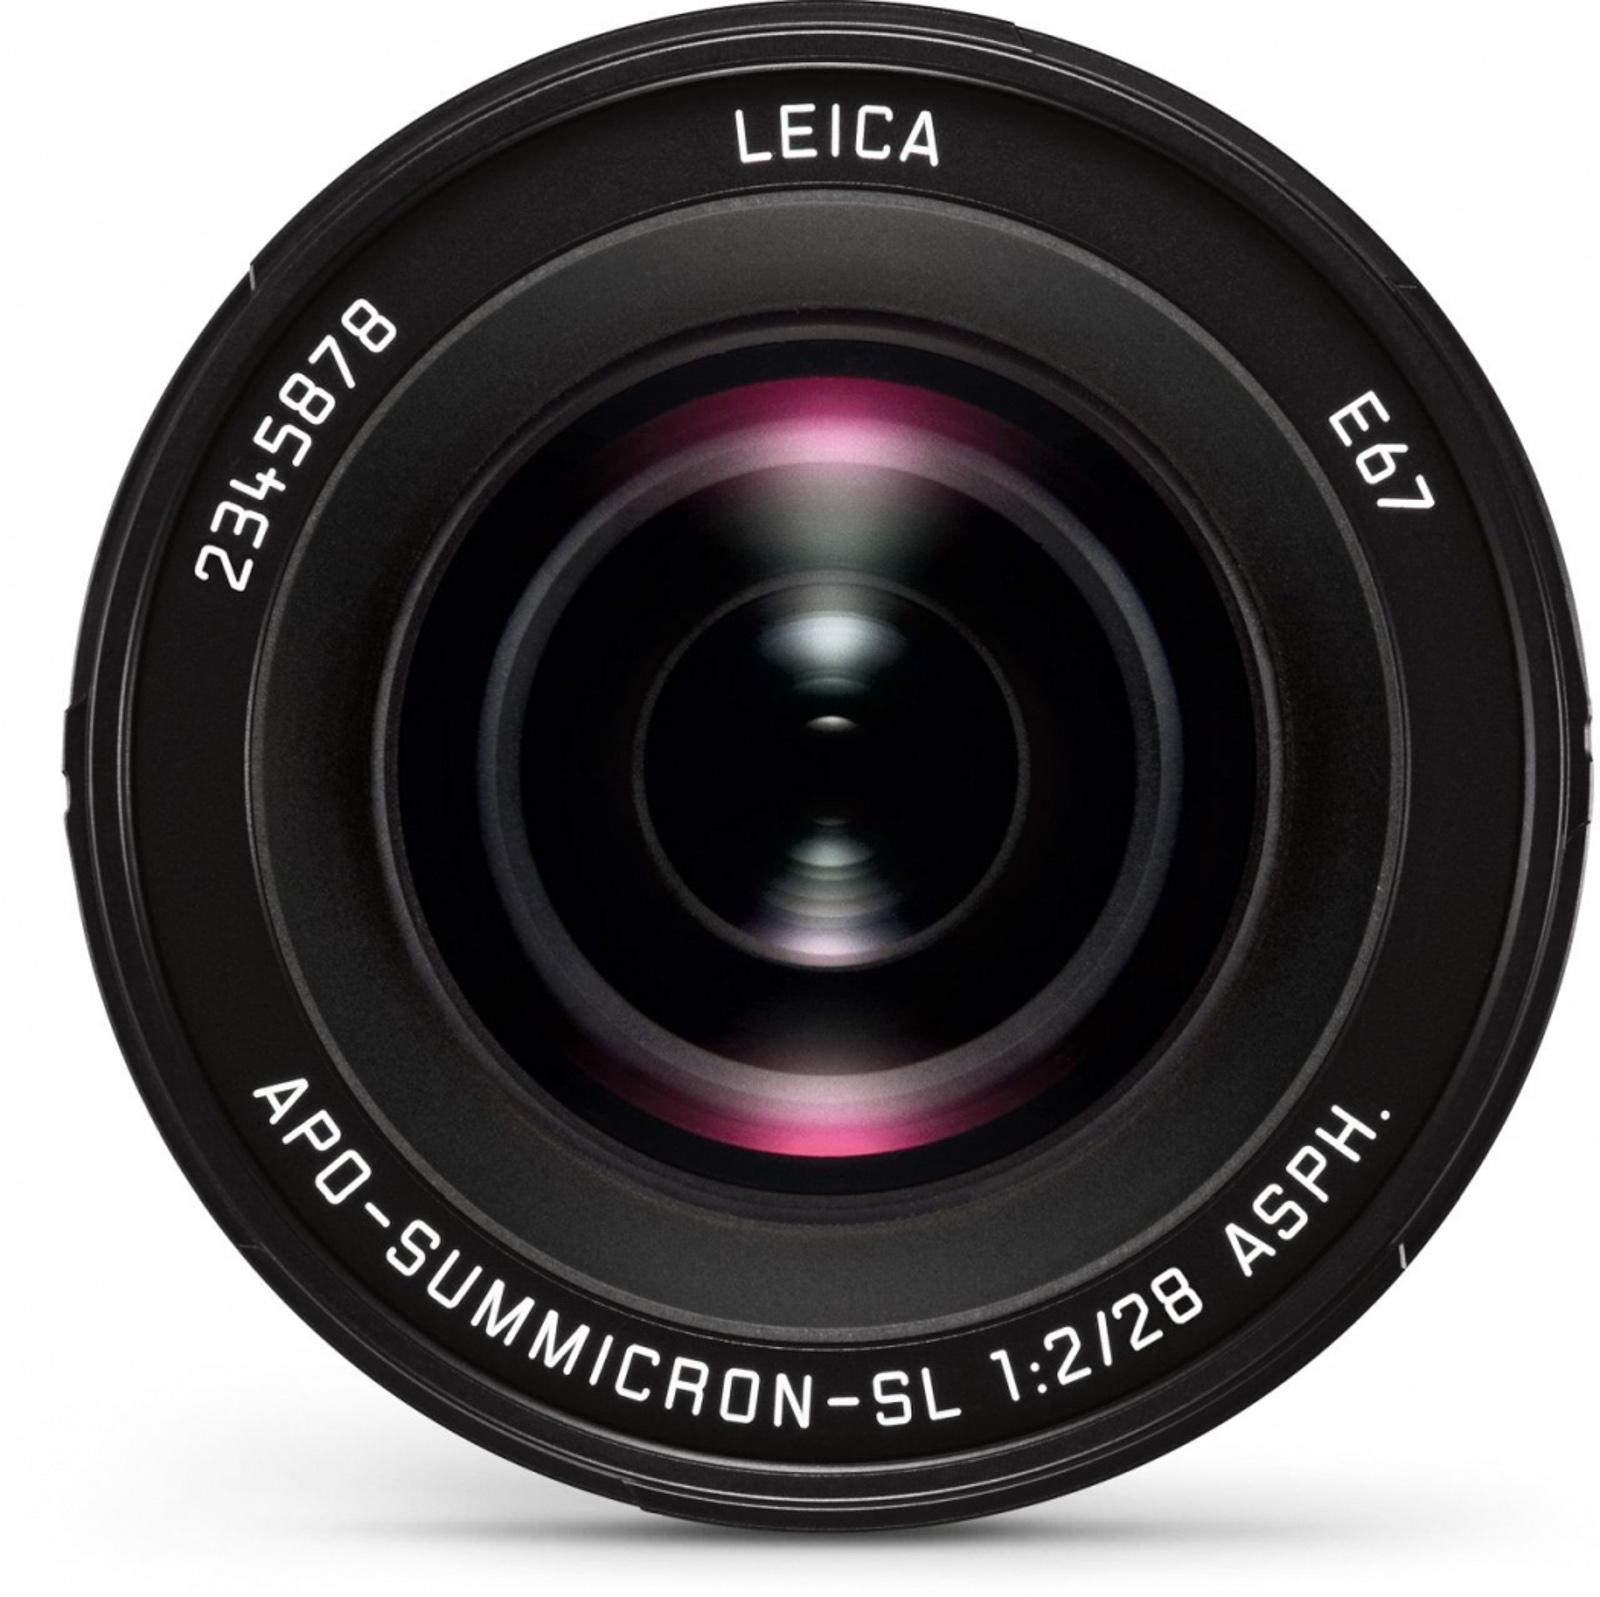 Leica APO-Summicron-SL 1:2/28 ASPH